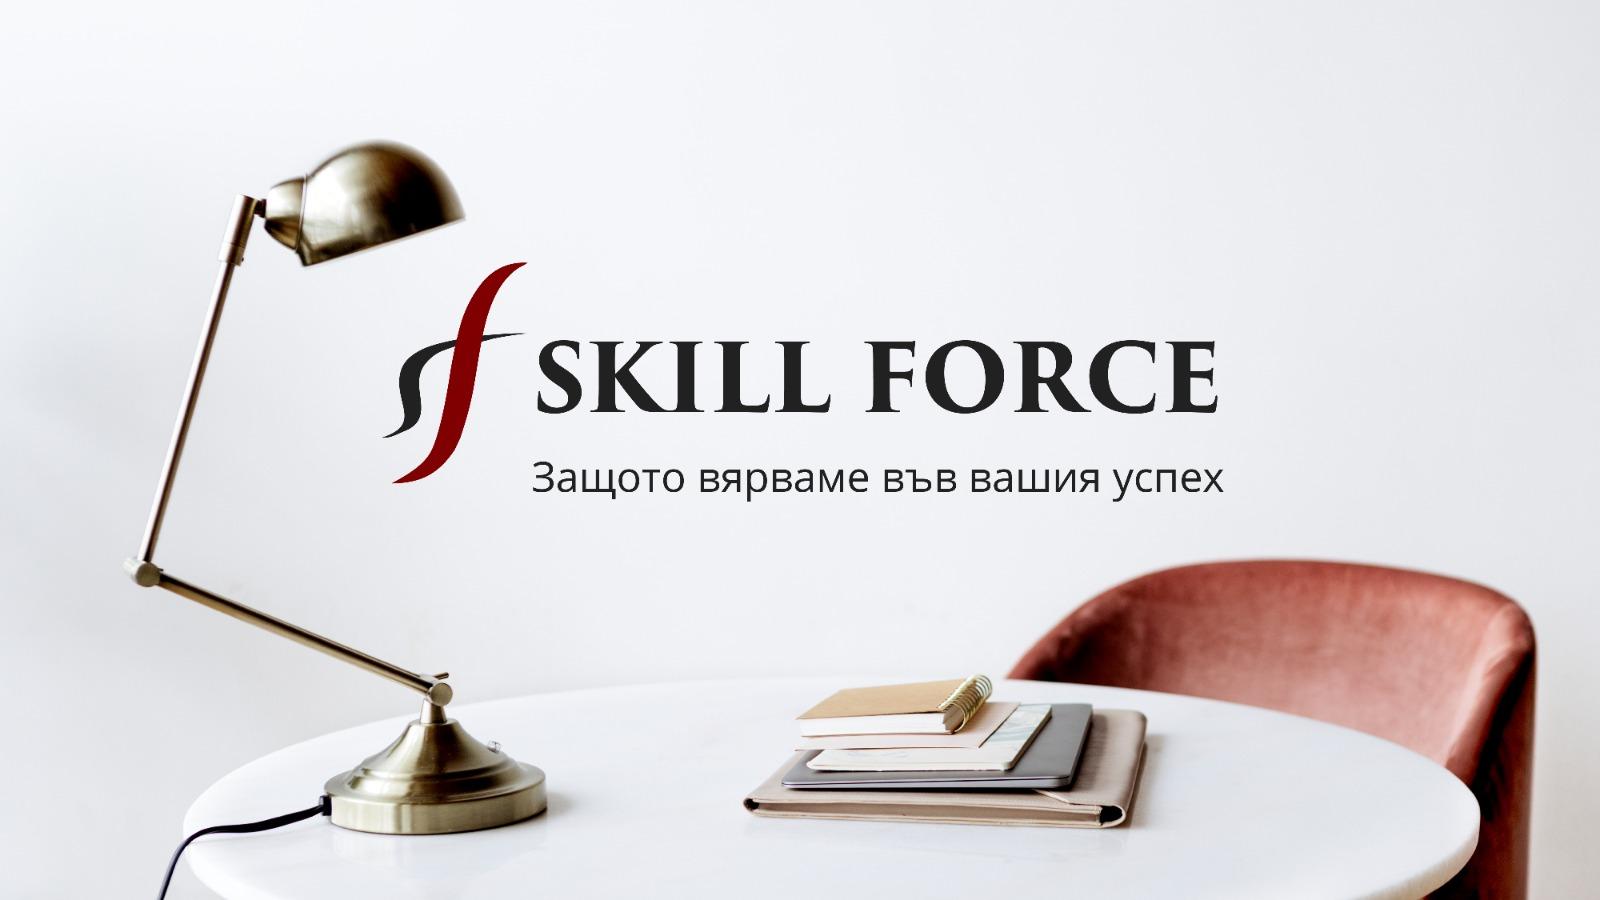 Skill Force